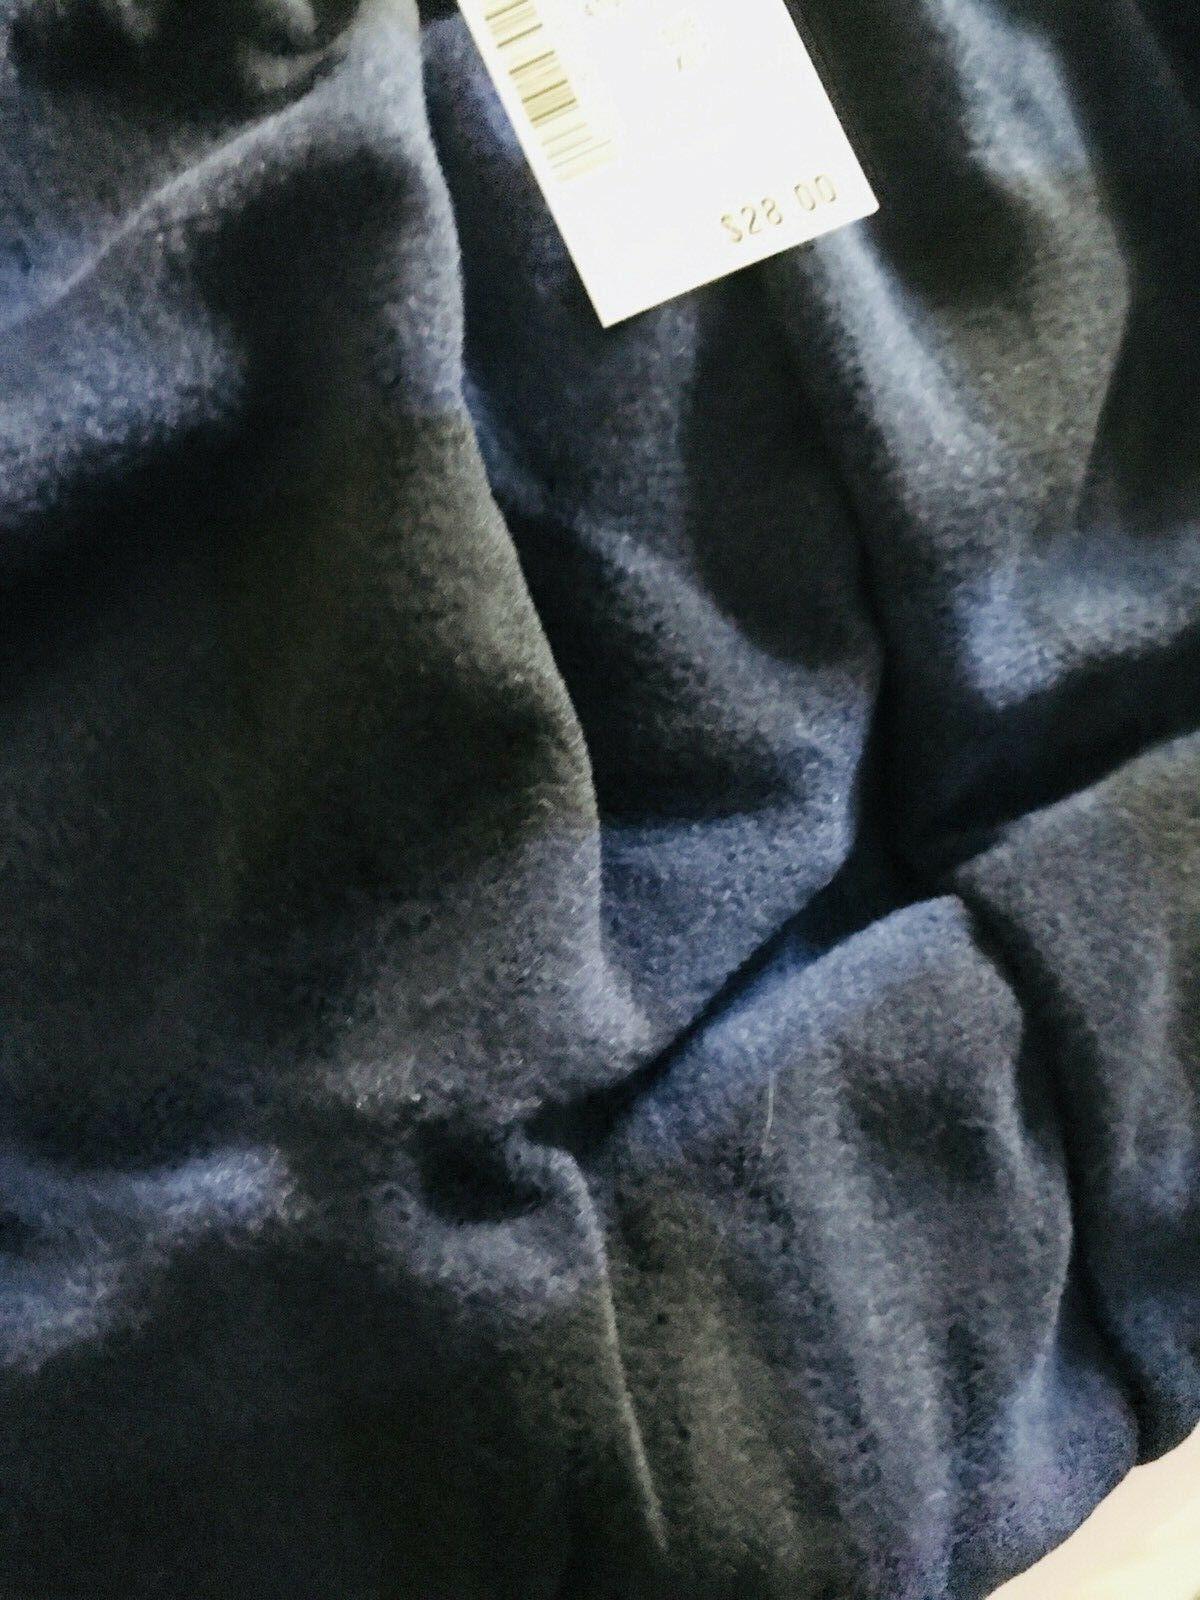 New MEN S PAJAMAS LOUNGE BLUE BLACK PLAID PANTS SLEEPWEAR SIZE XL  - $19.99